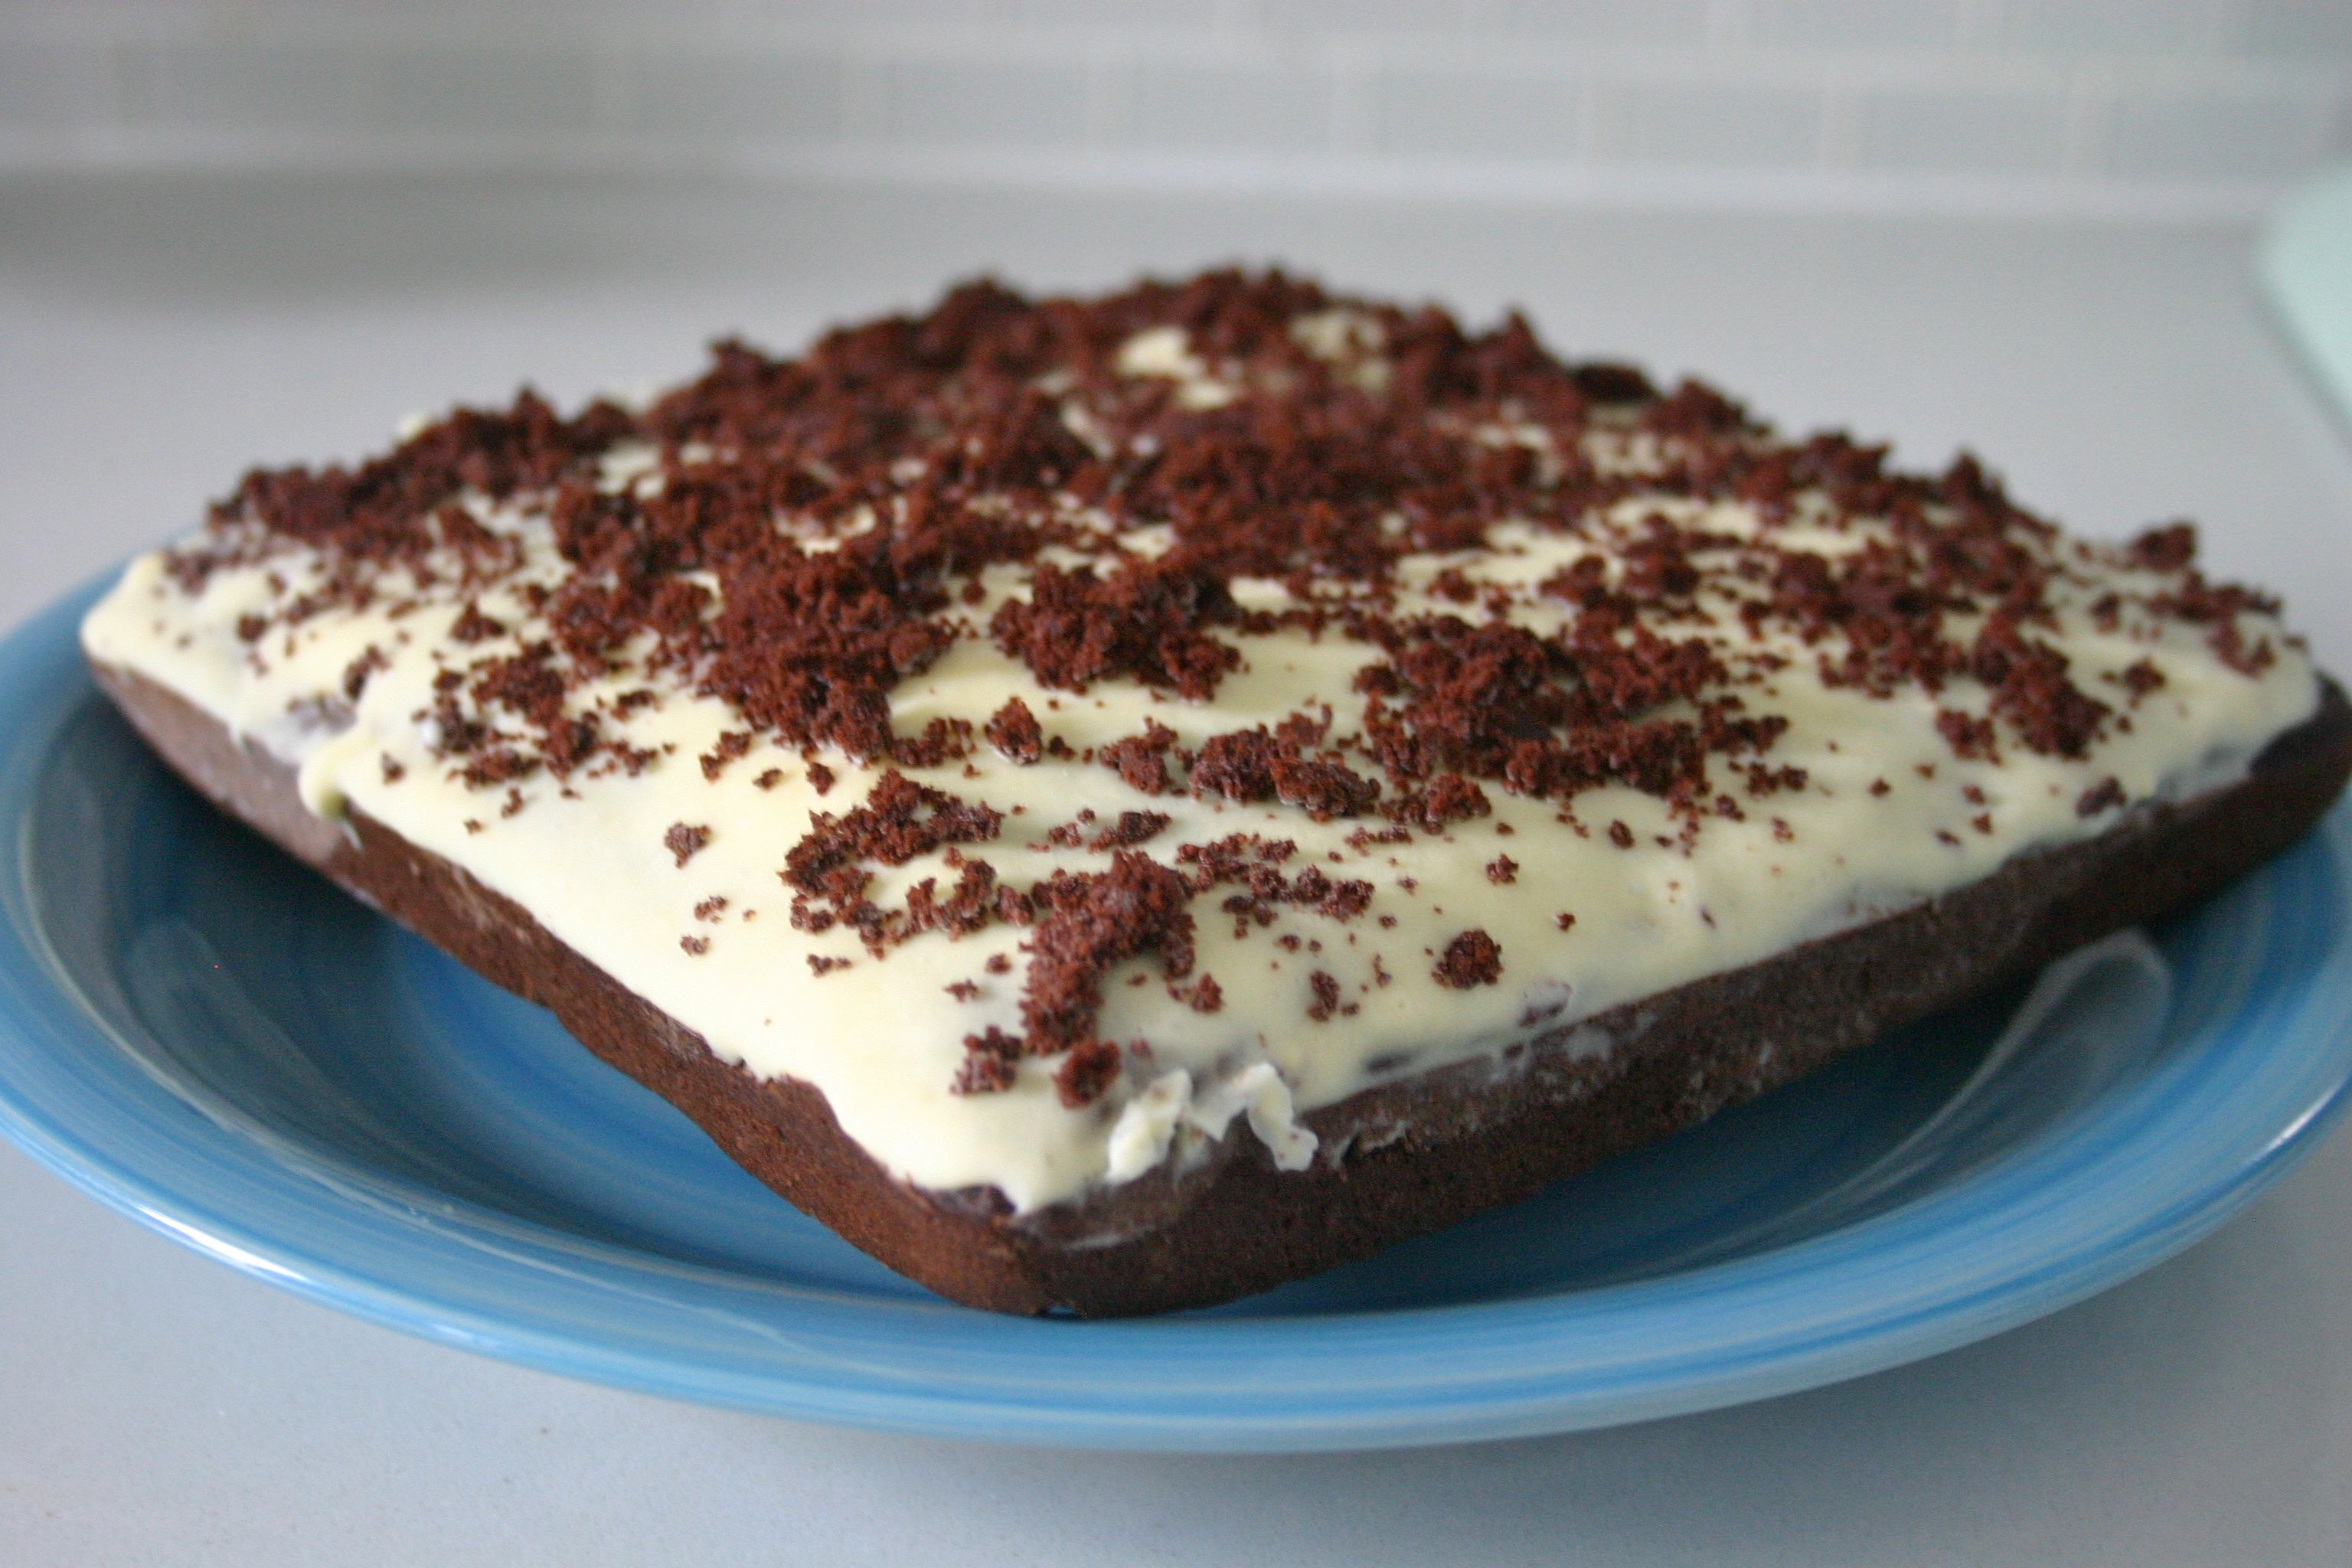 Gluten Free And Sugar Entenmanns Devils Food Cake By Jesicakes